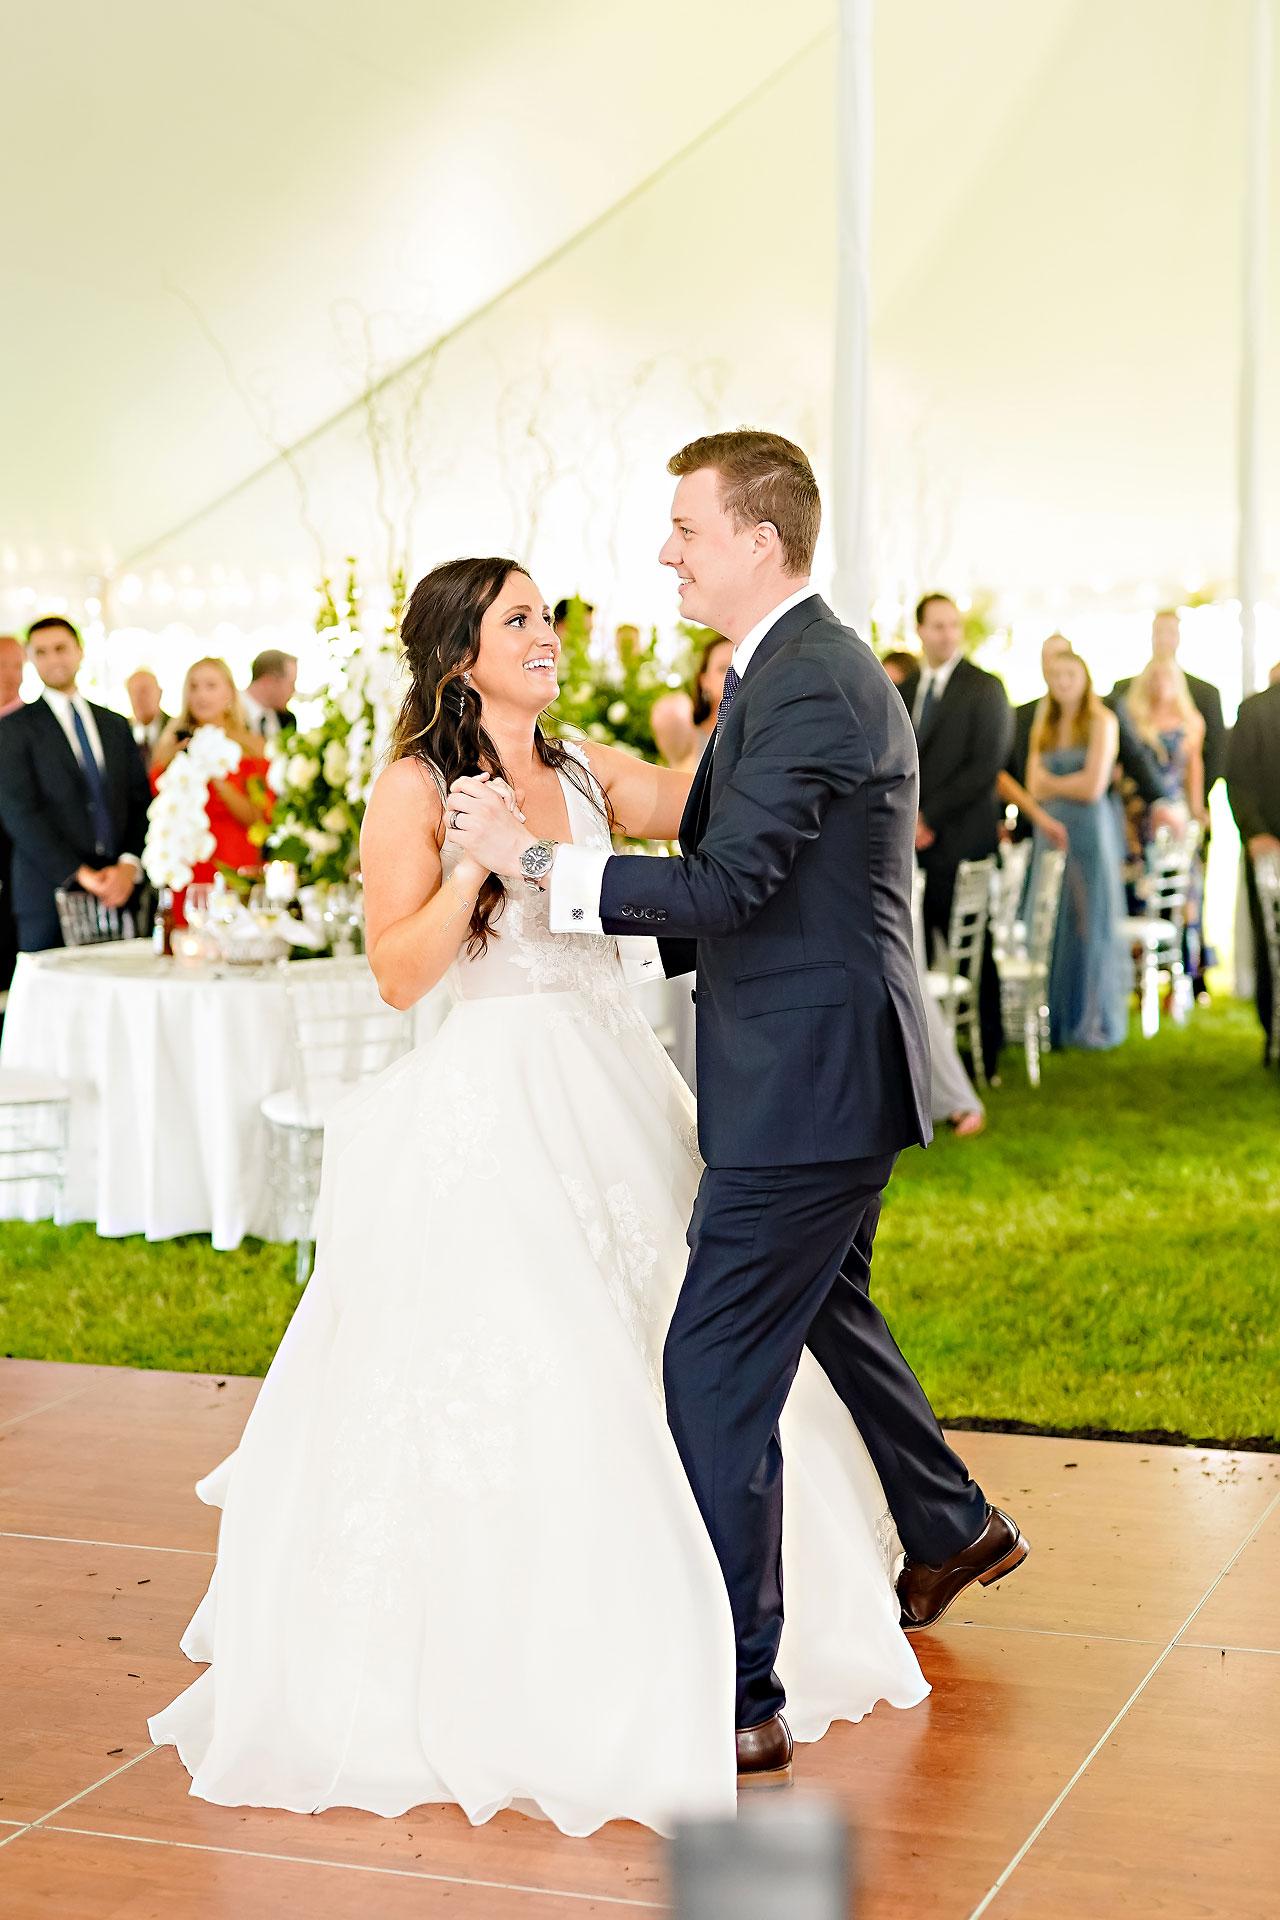 MacKinze John Lafayette Indiana Purdue Wedding 269